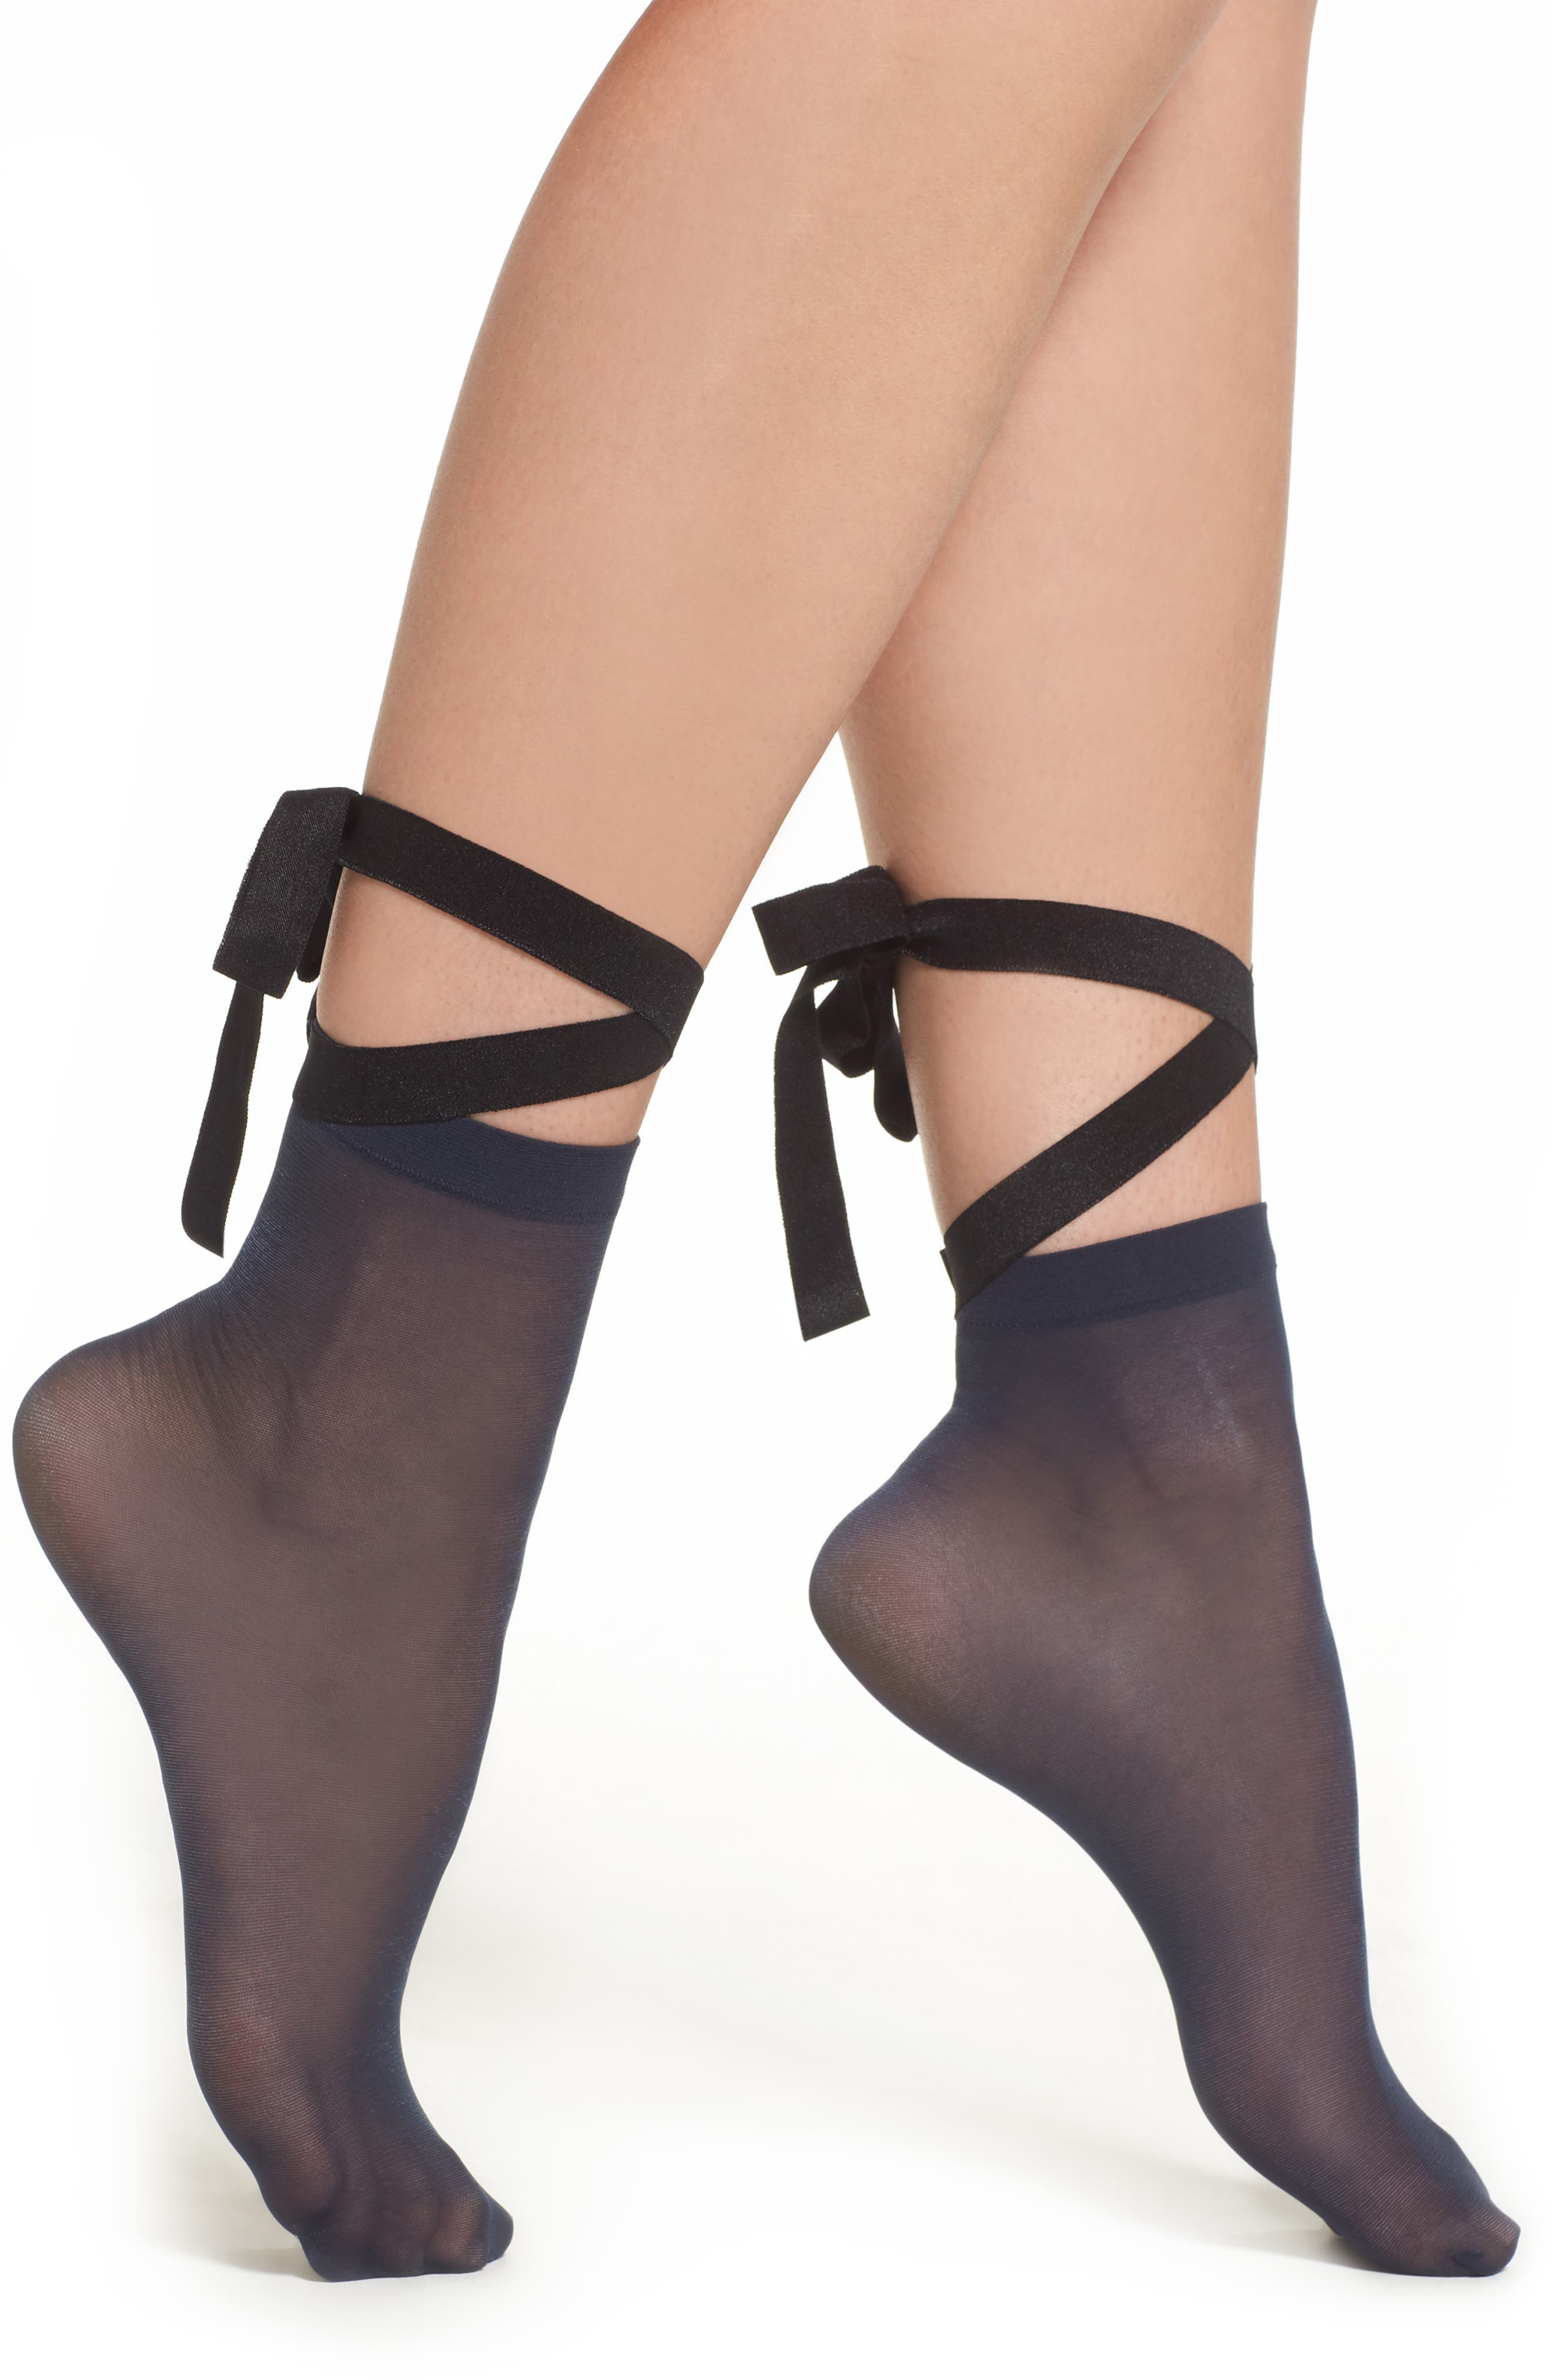 Patrizia Lace-Up Socks,                             Main thumbnail 1, color,                             Dark Blue